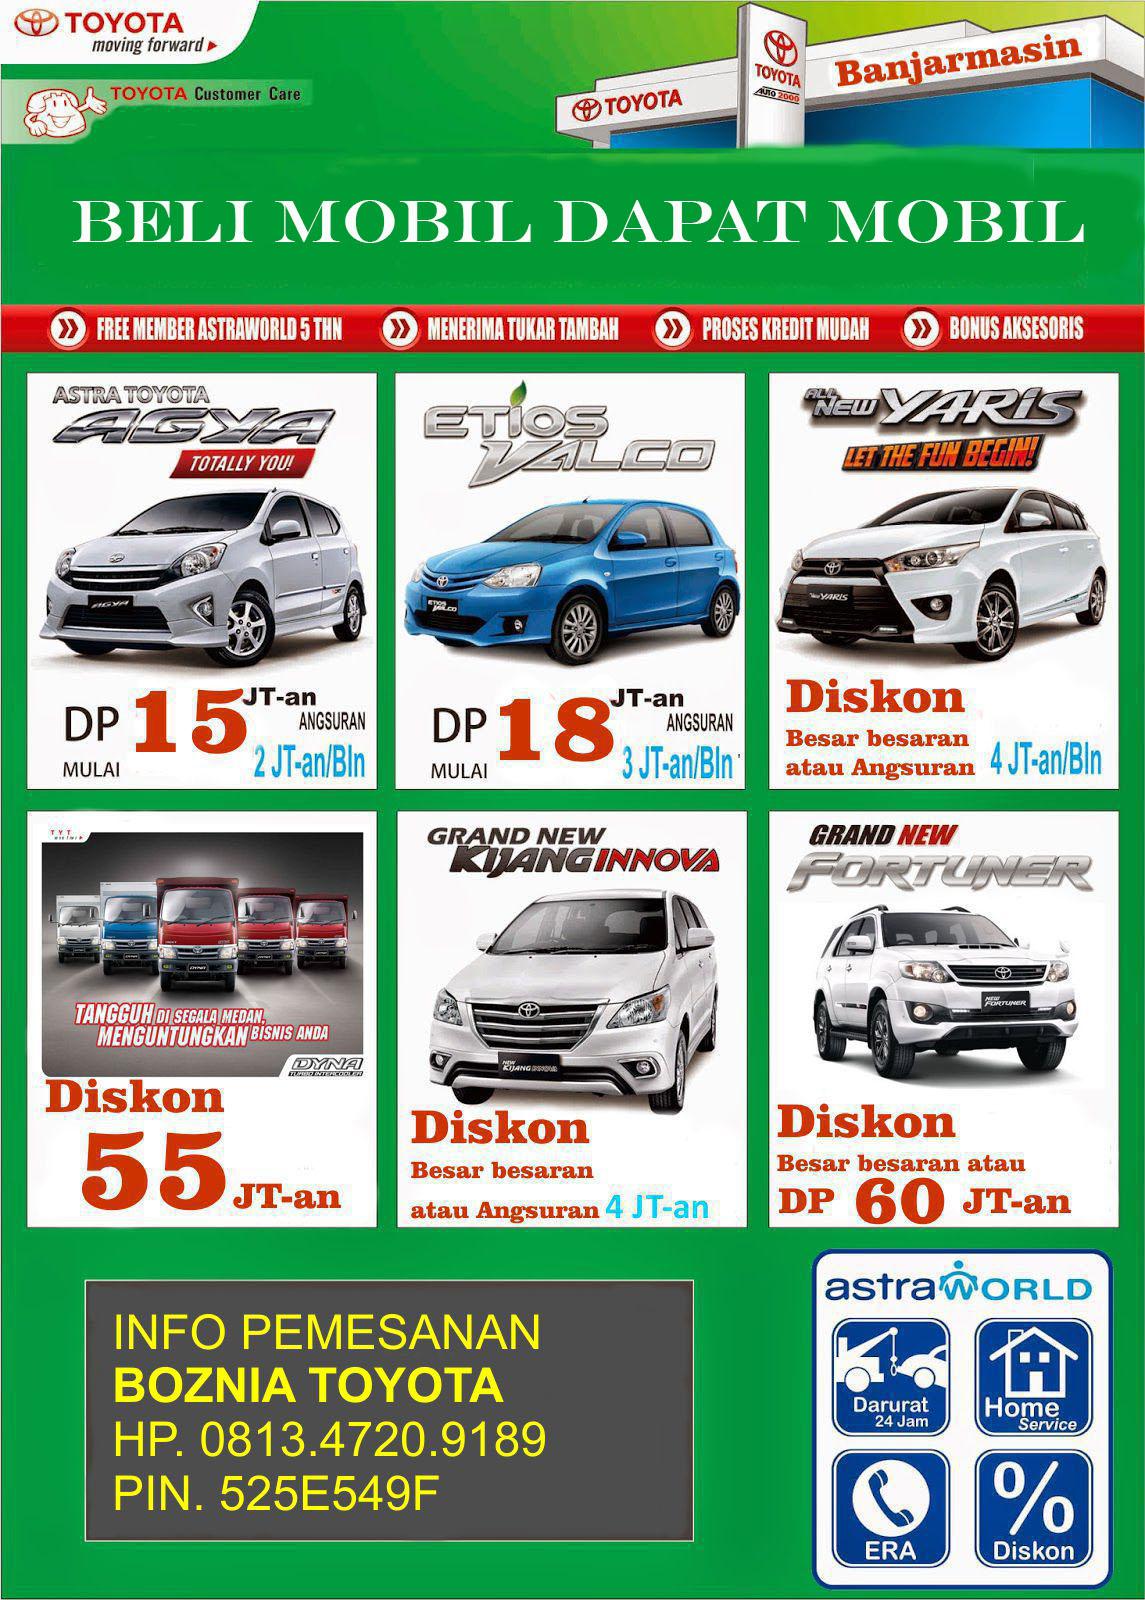 toyota yaris 2014 trd bekas jual grand new avanza di depok auto2000 banjarmasin: 10/11/15